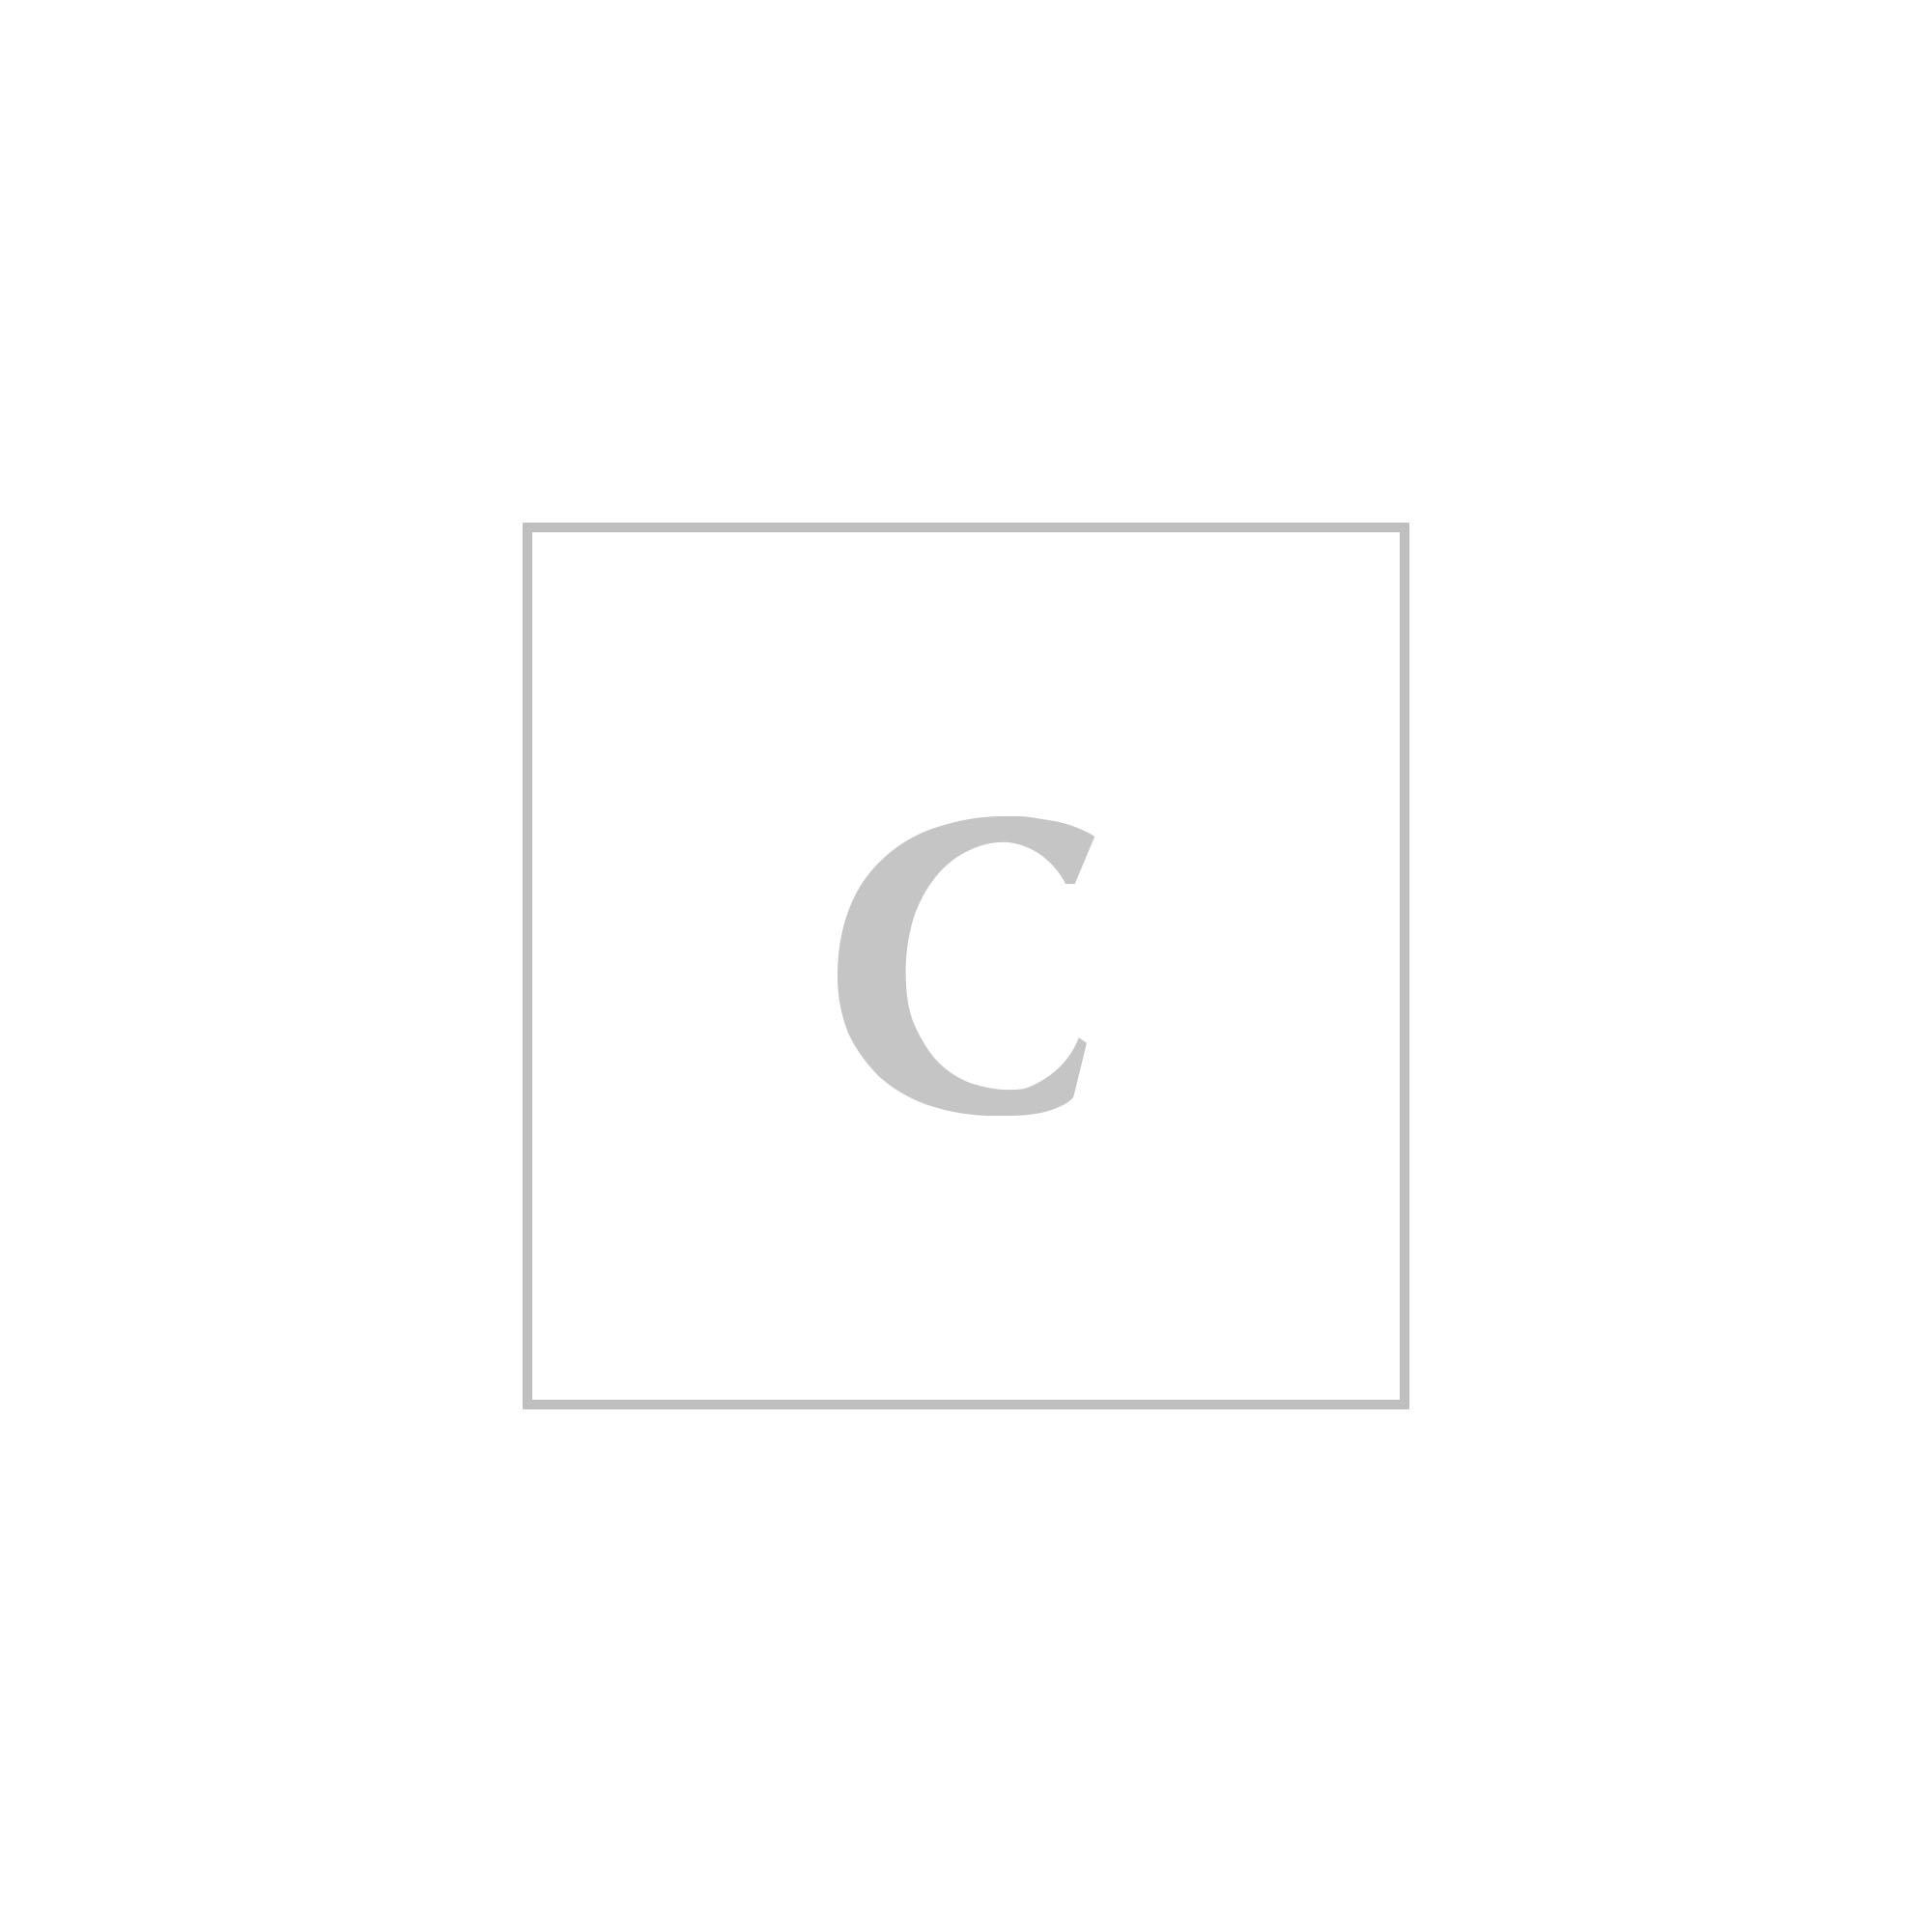 stella mccartney bags women falabella crossbody mini bag